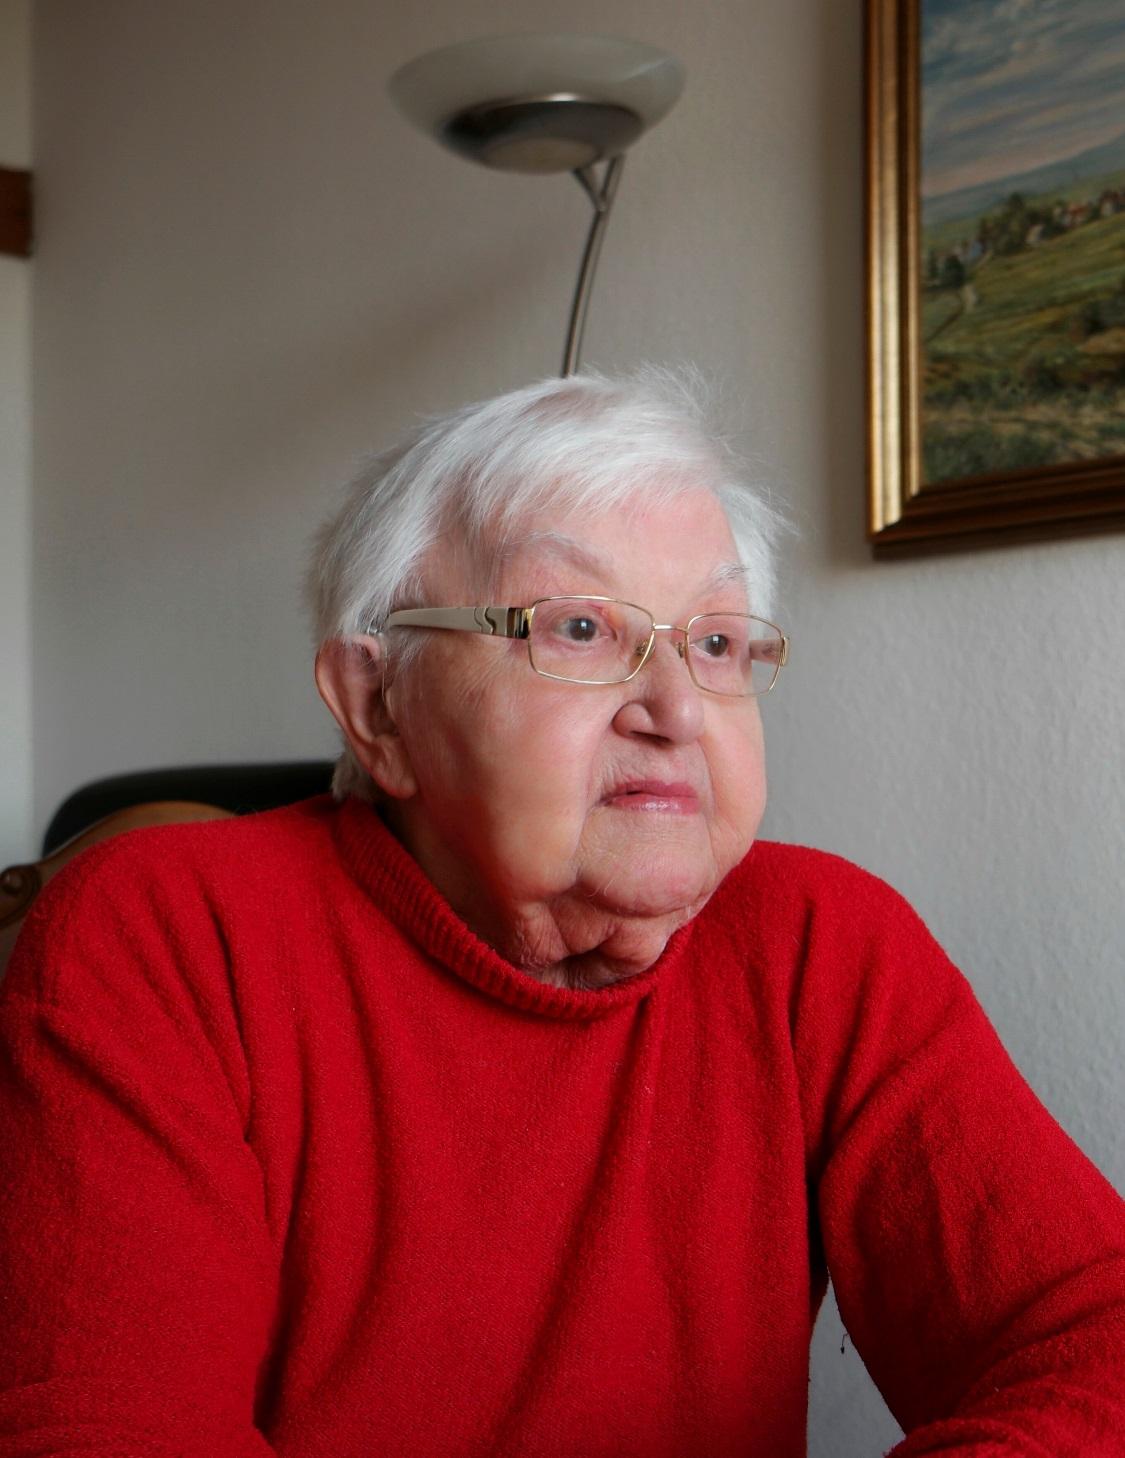 Waltrud Krämer